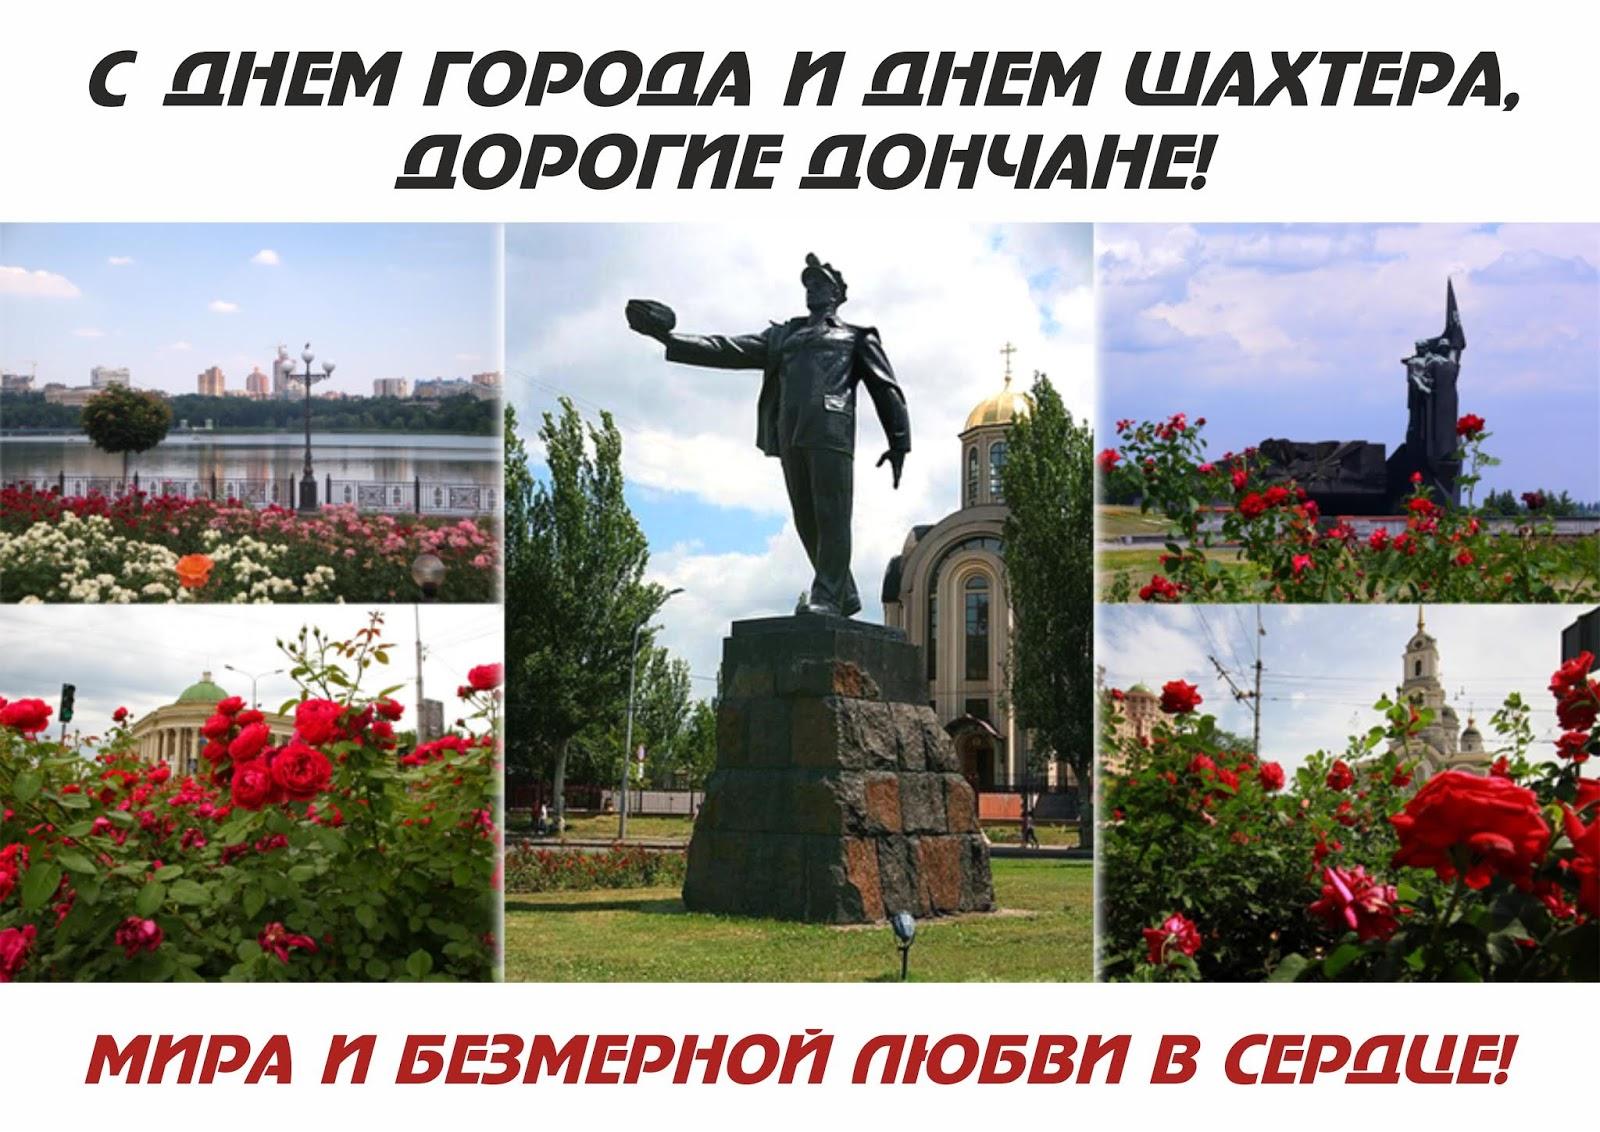 Открытки с днем города донецка с днем шахтера, картинки